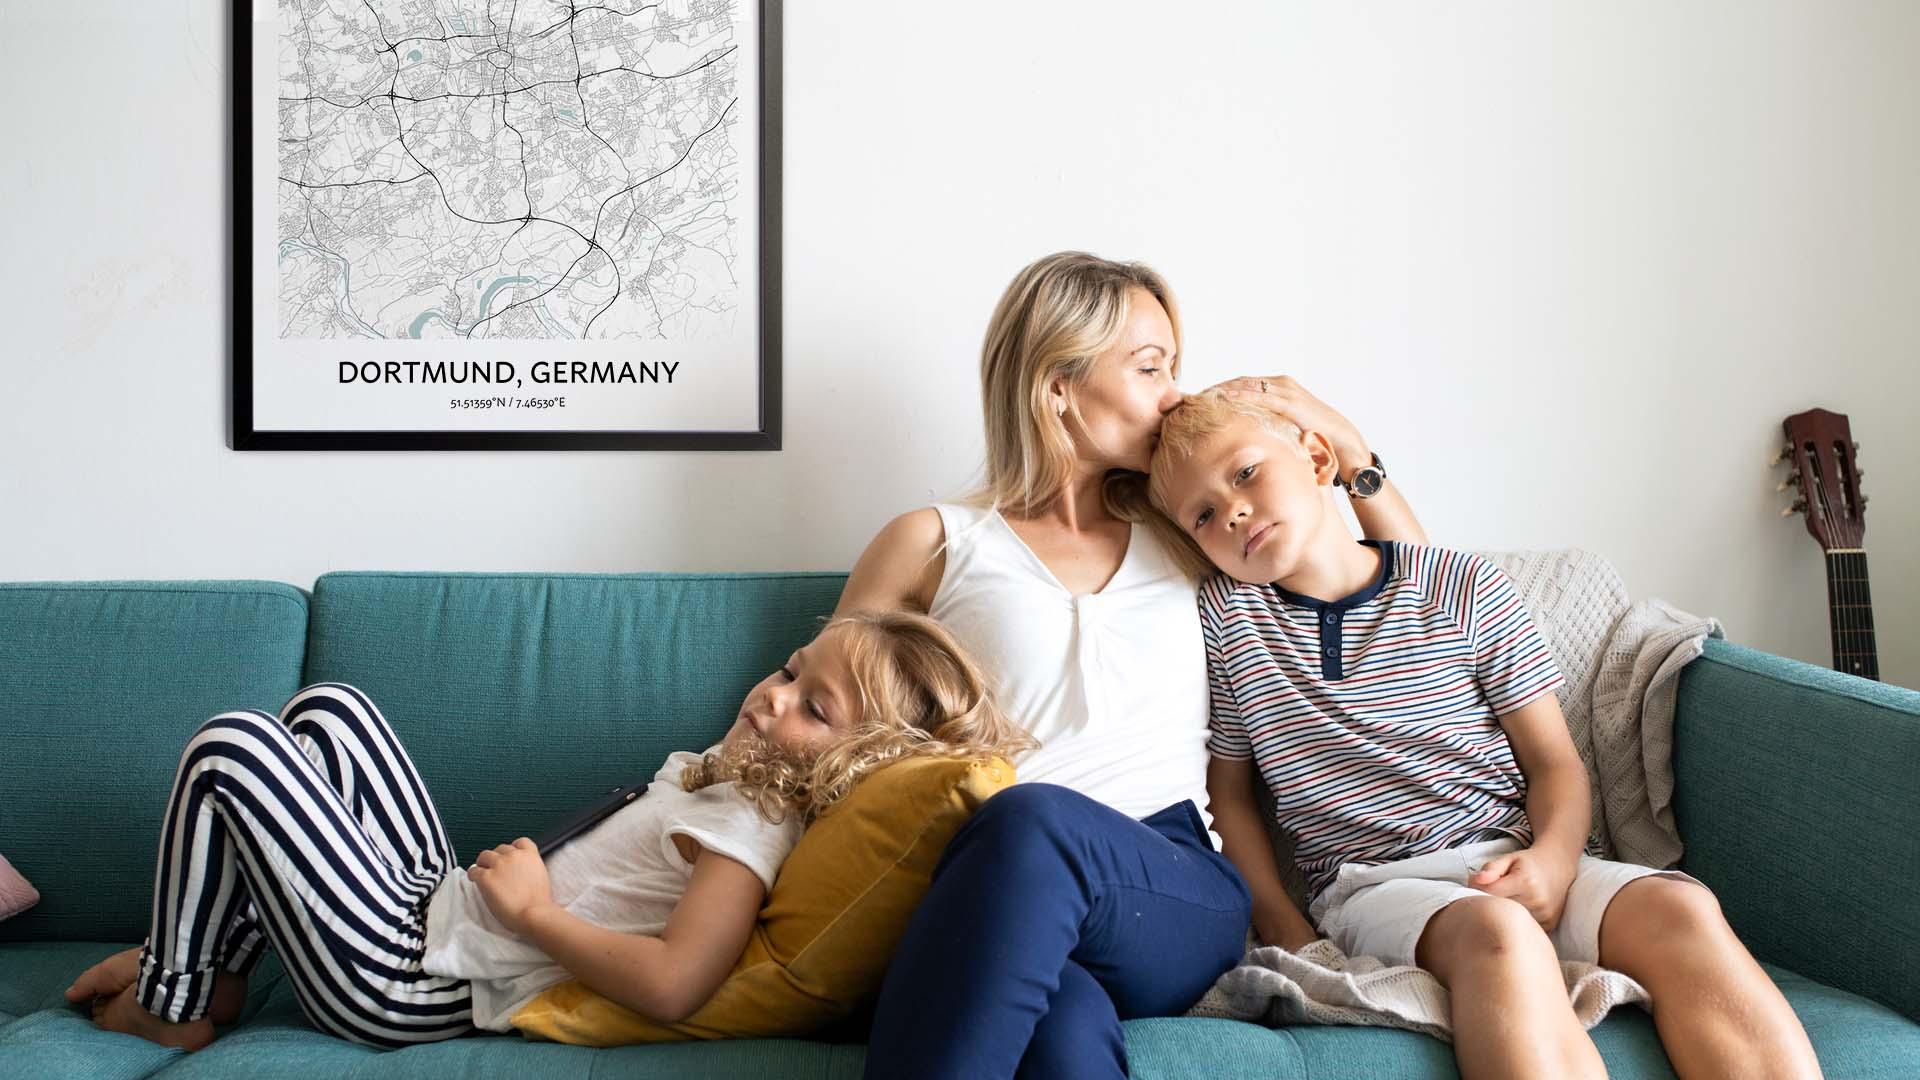 Dortmund map poster